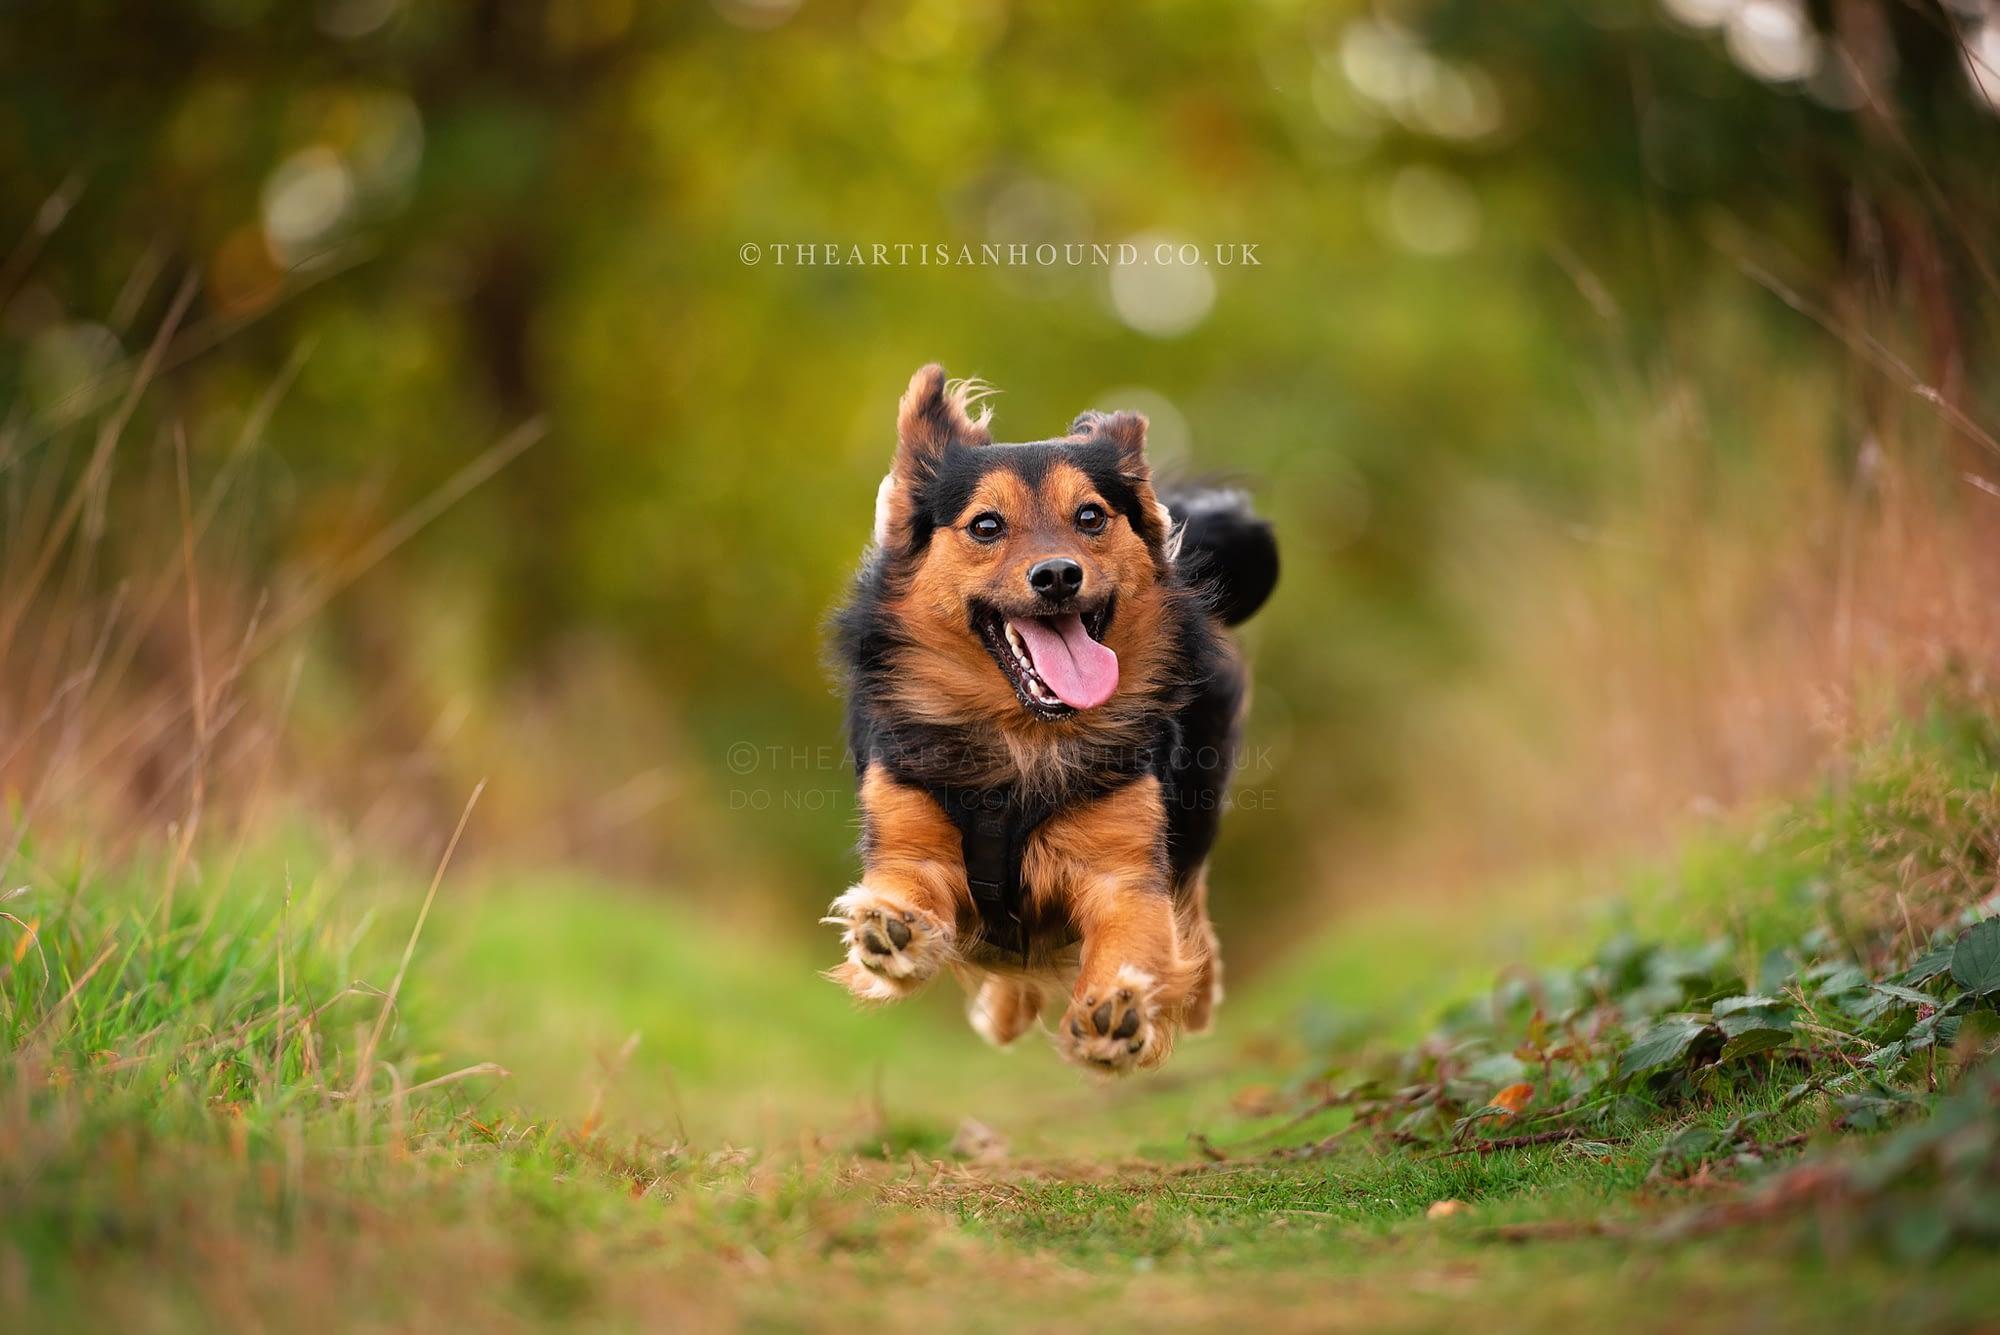 Black and tan crossbreed dog running towards camera